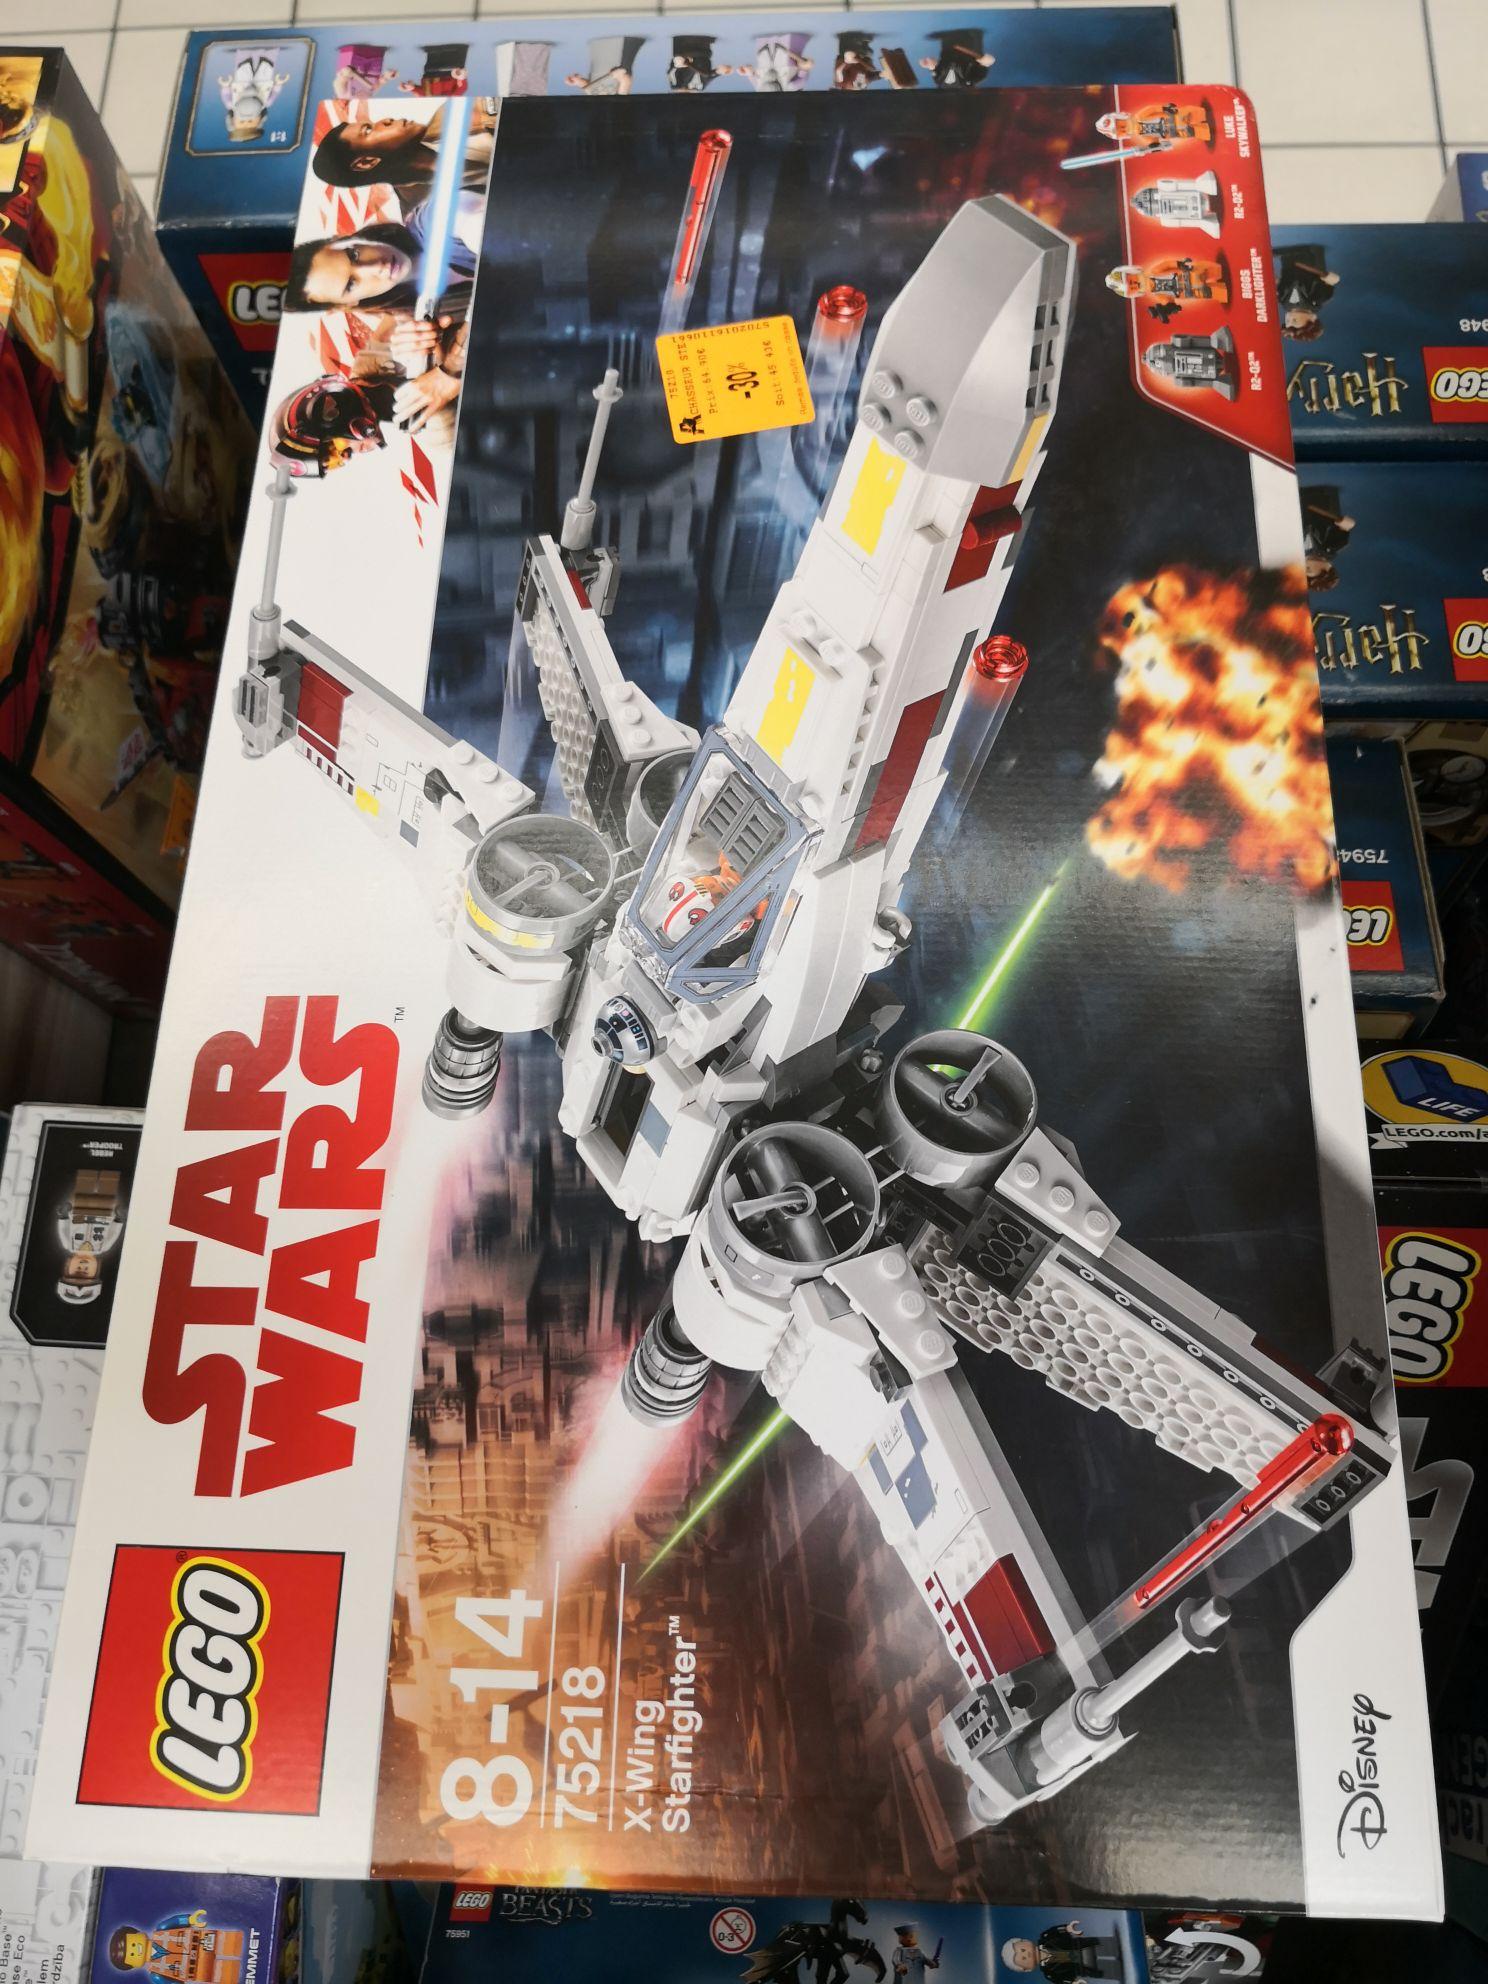 Sélection de Lego Star Wars en promotion - Ex : Lego Star Wars X-Wing Starfighter 75218 - Chambray-lès-Tours (37)